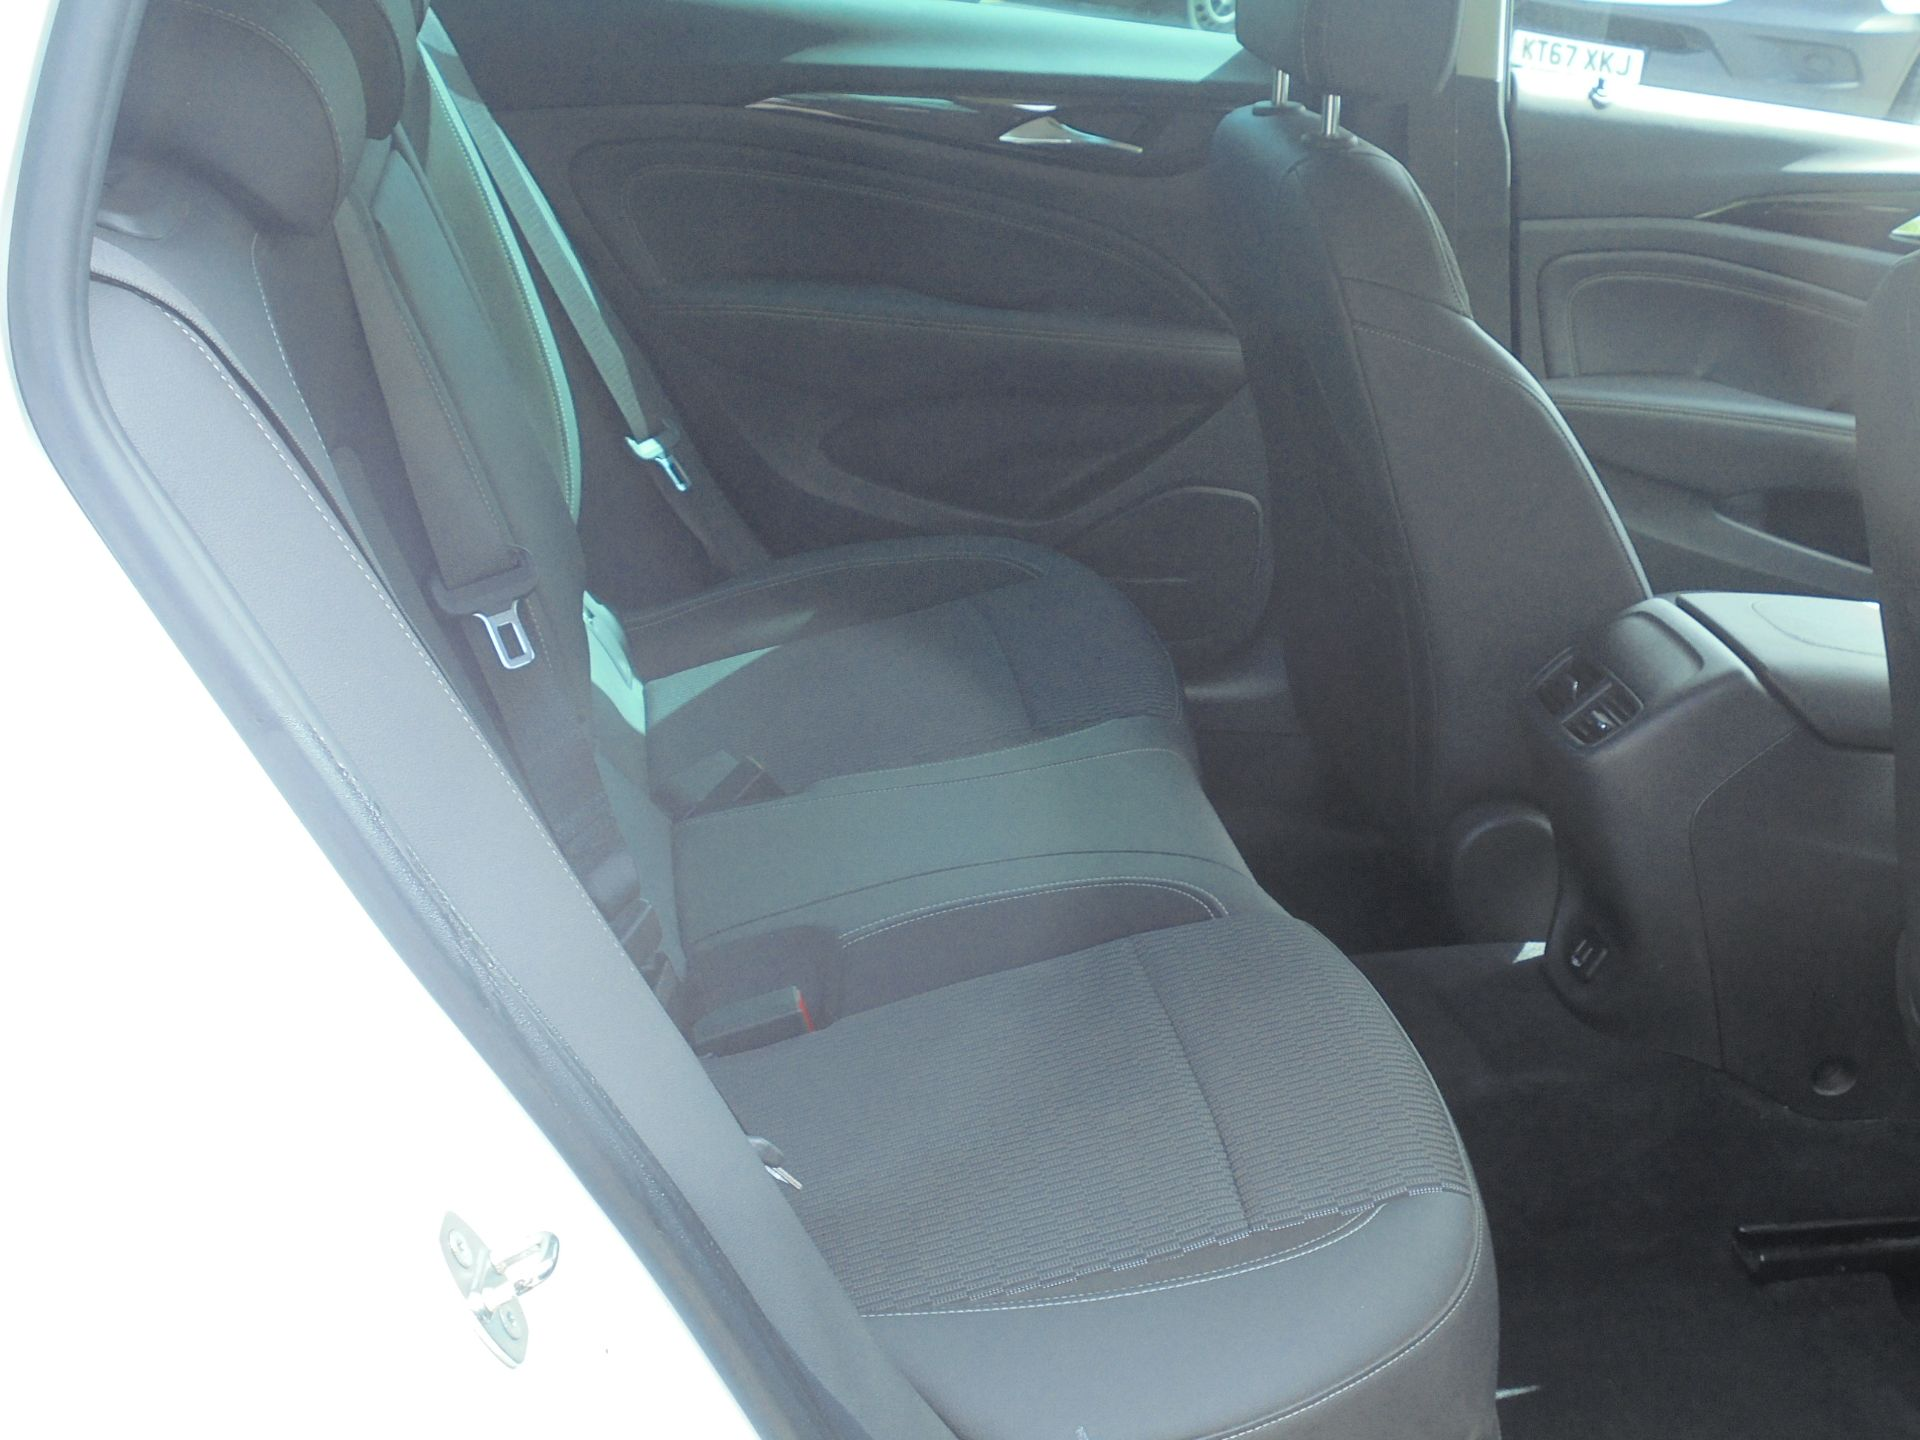 2018 Vauxhall Insignia Grand Sport 1.6 Turbo D Ecotec [136] Sri Nav 5Dr (VU18DFF) Image 11